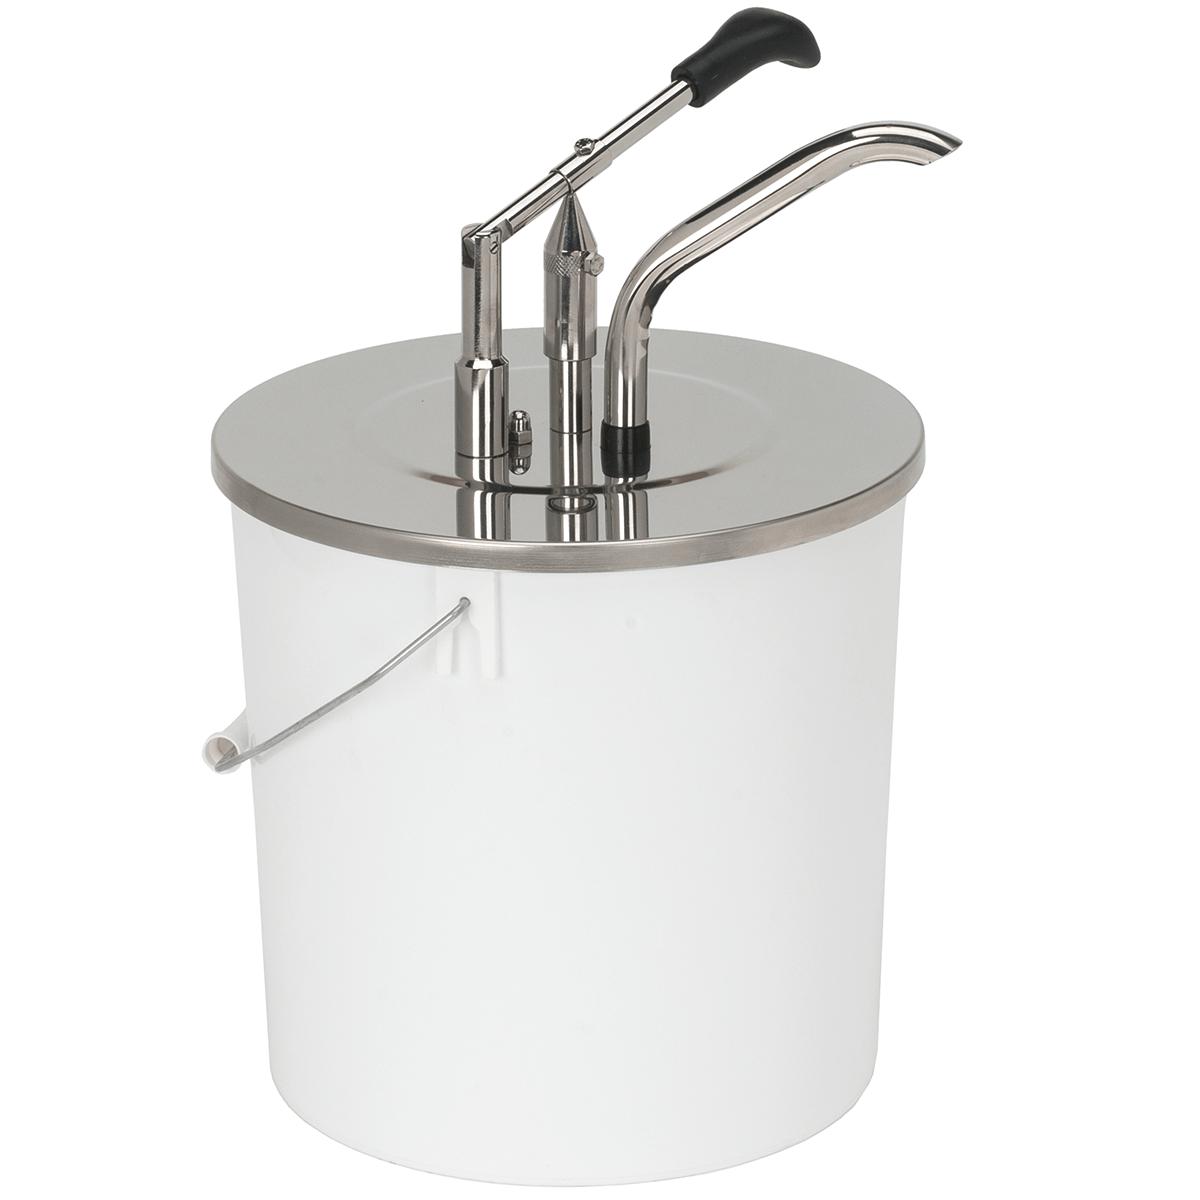 Bucket Lever-action Dispenser